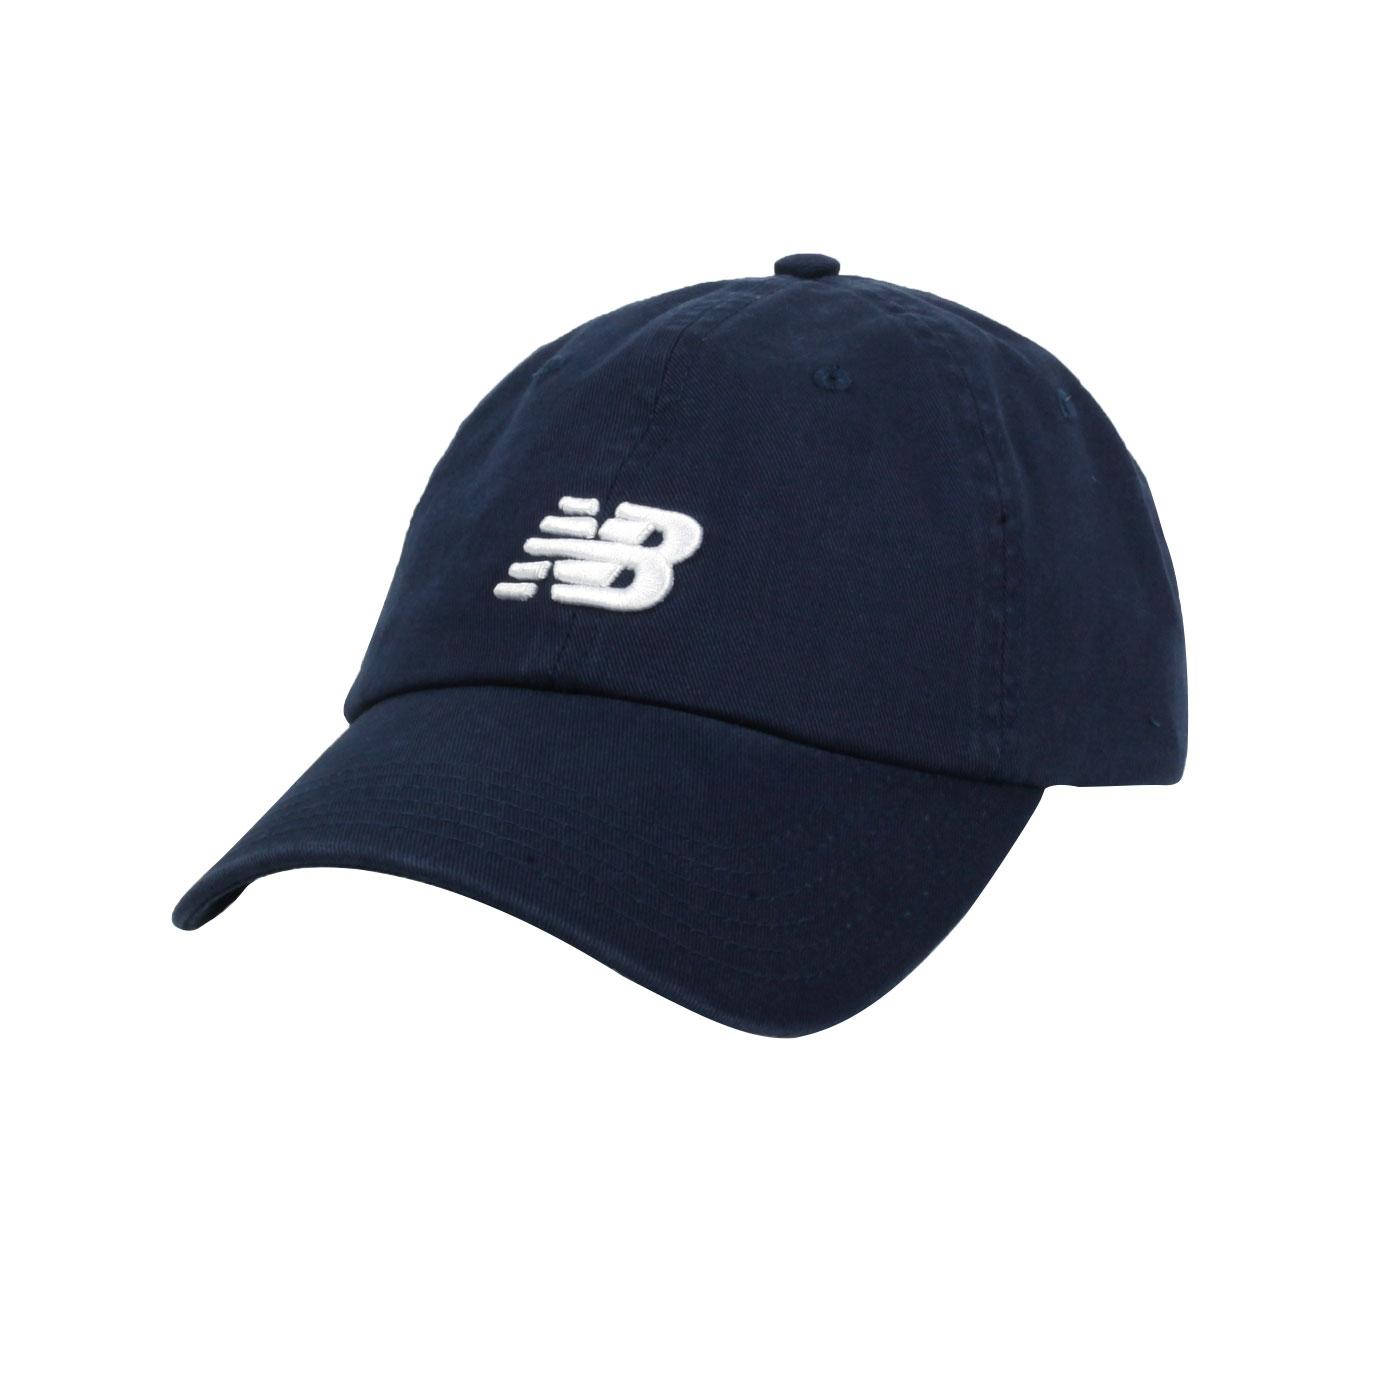 NEW BALANCE 棒球帽 LAH91014BK - 丈青